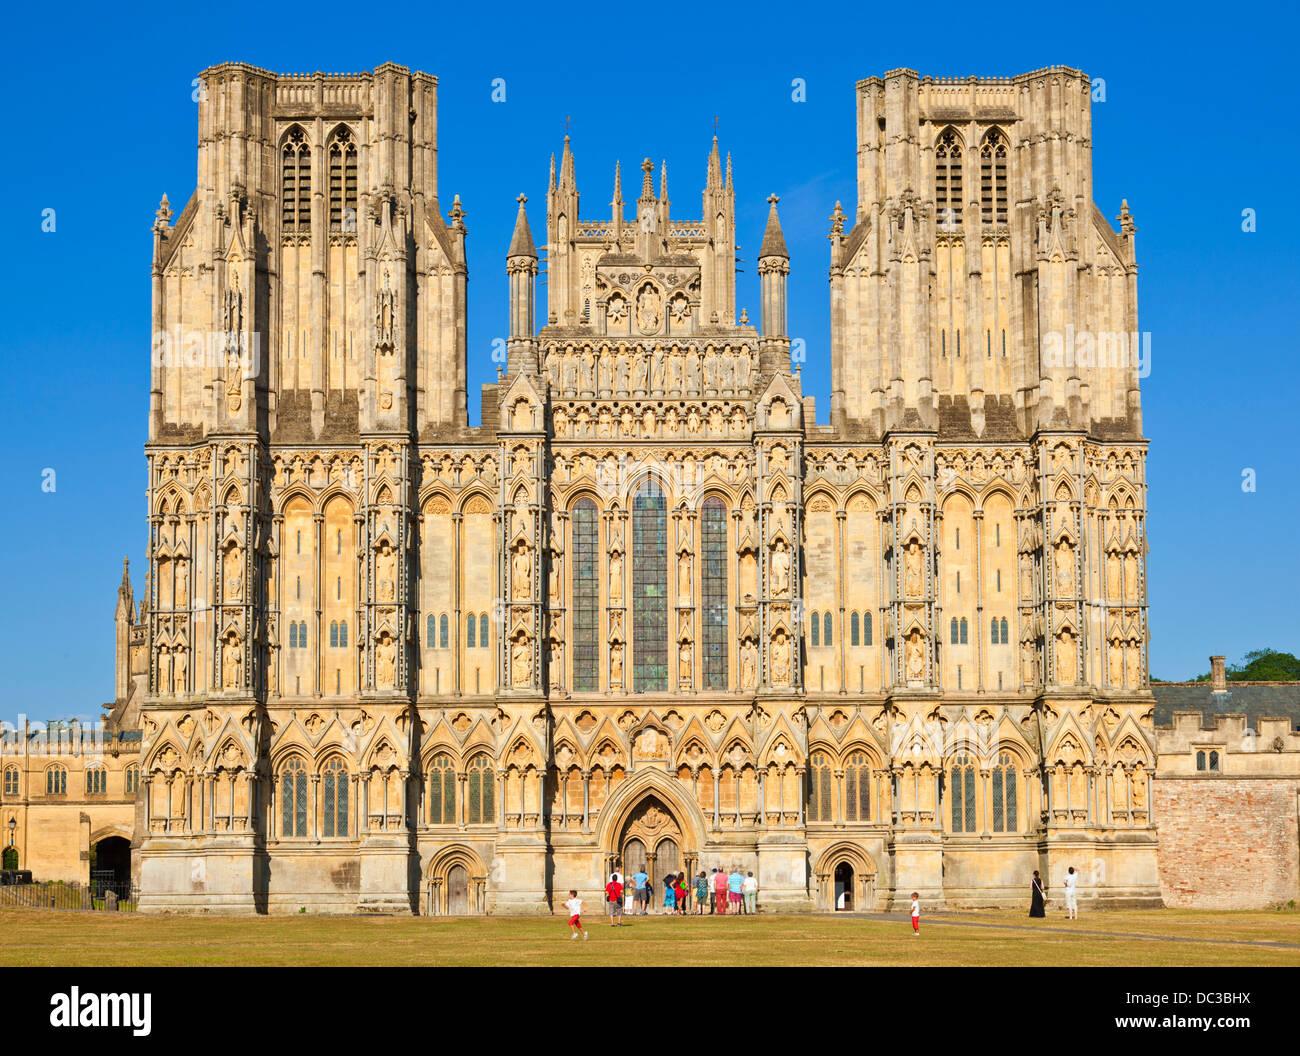 Visiteurs en avant de la façade de la cathédrale de Wells Wells Somerset England UK GB EU Europe Banque D'Images